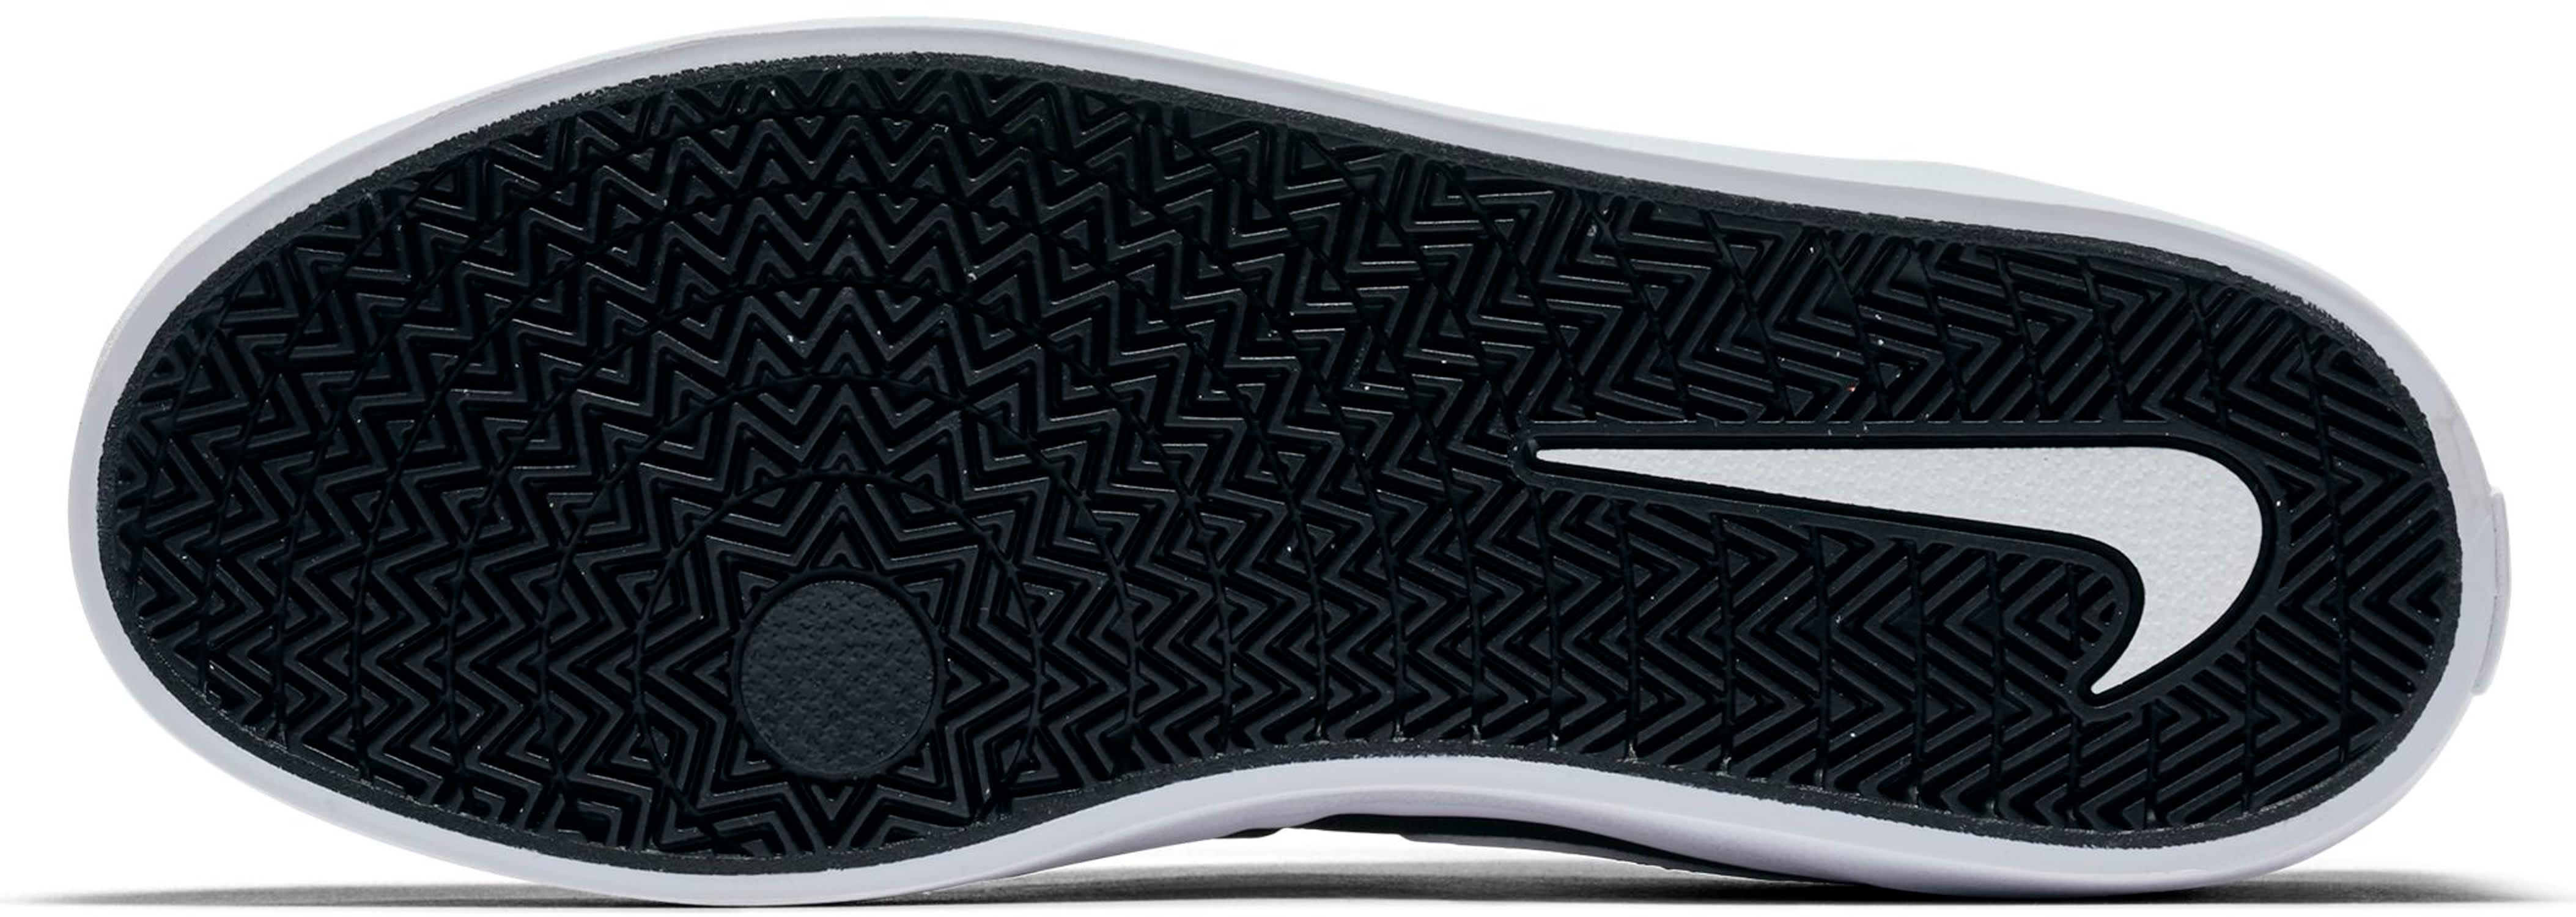 fc87bff287 Nike SB Check Solarsoft Canvas Skate Shoes - thumbnail 6